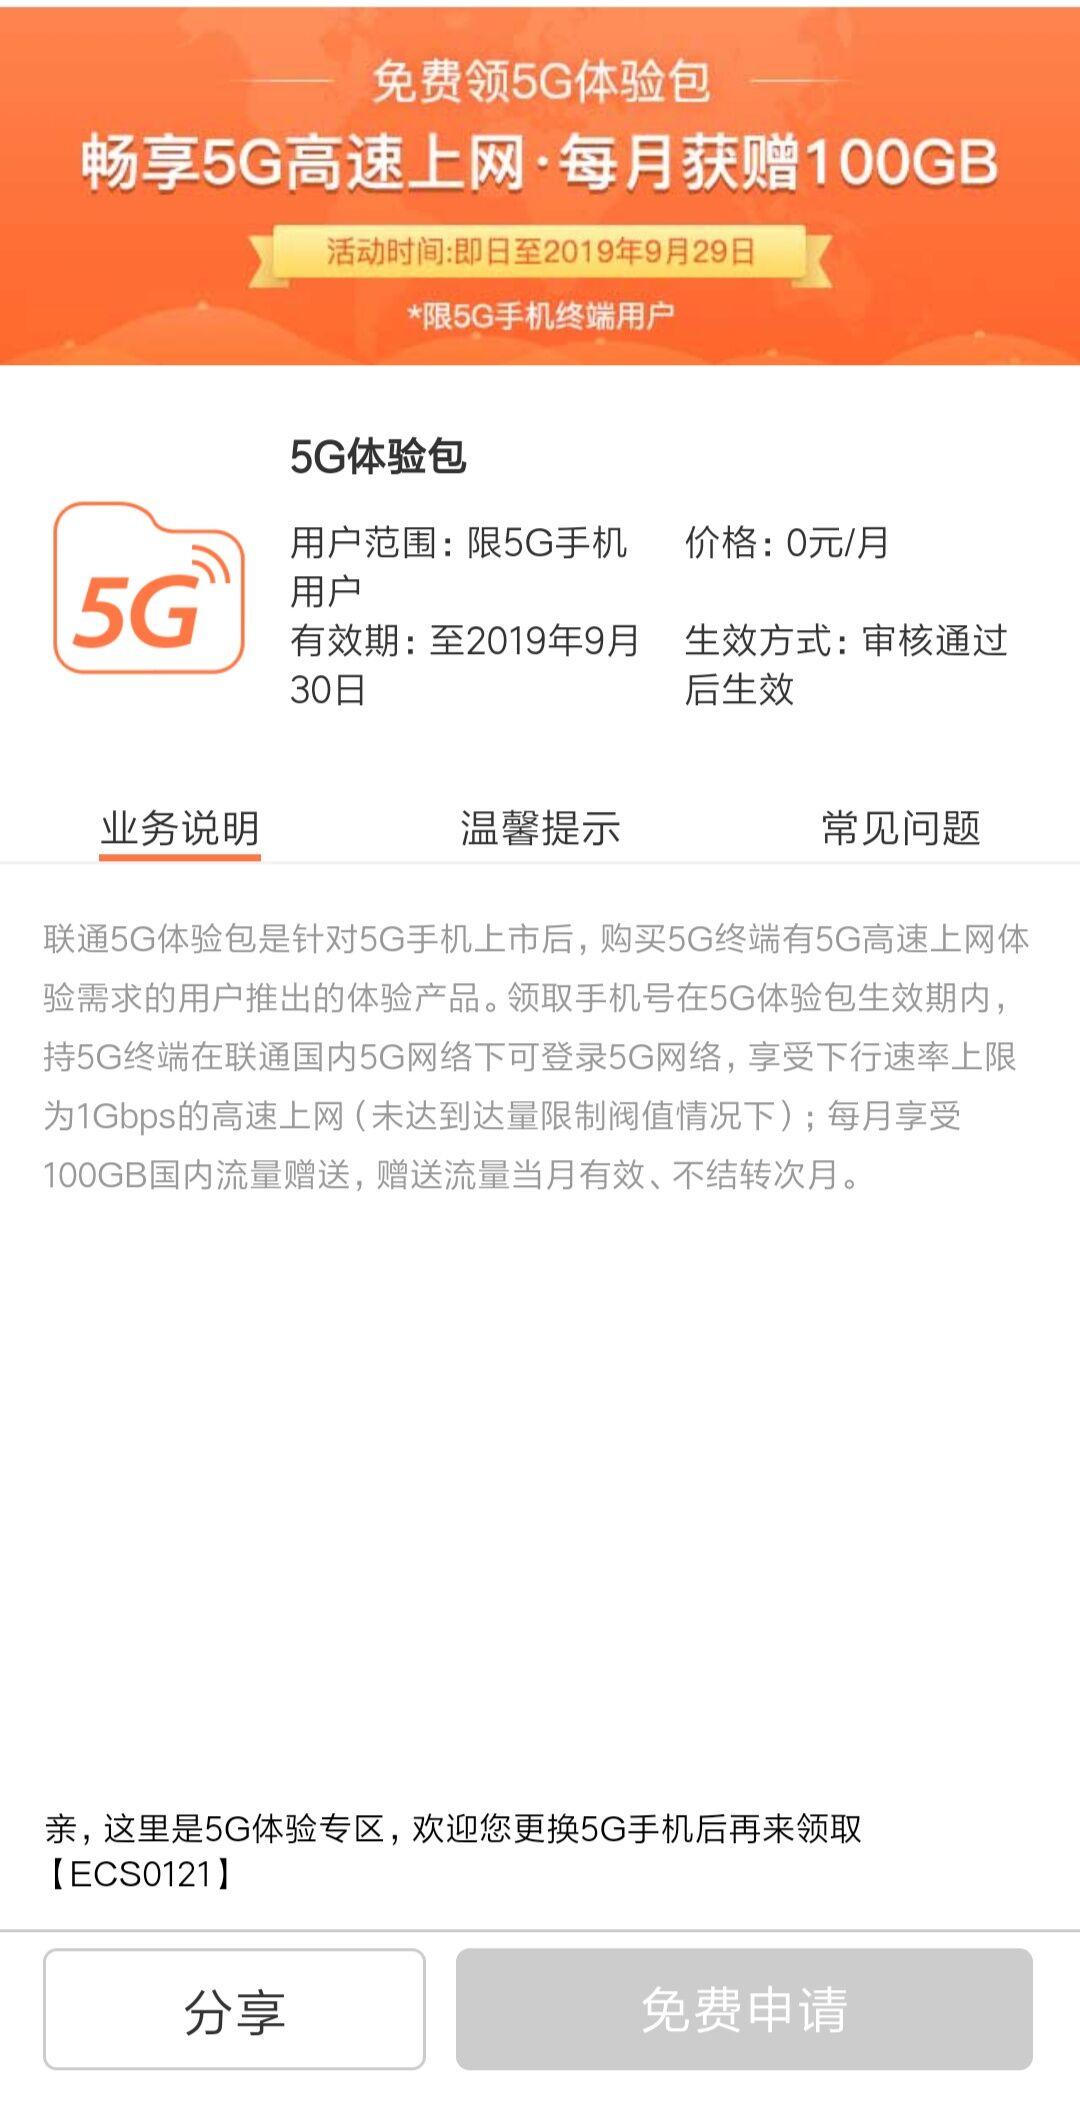 5G手机得伙伴可以免费体验每月100G流量~